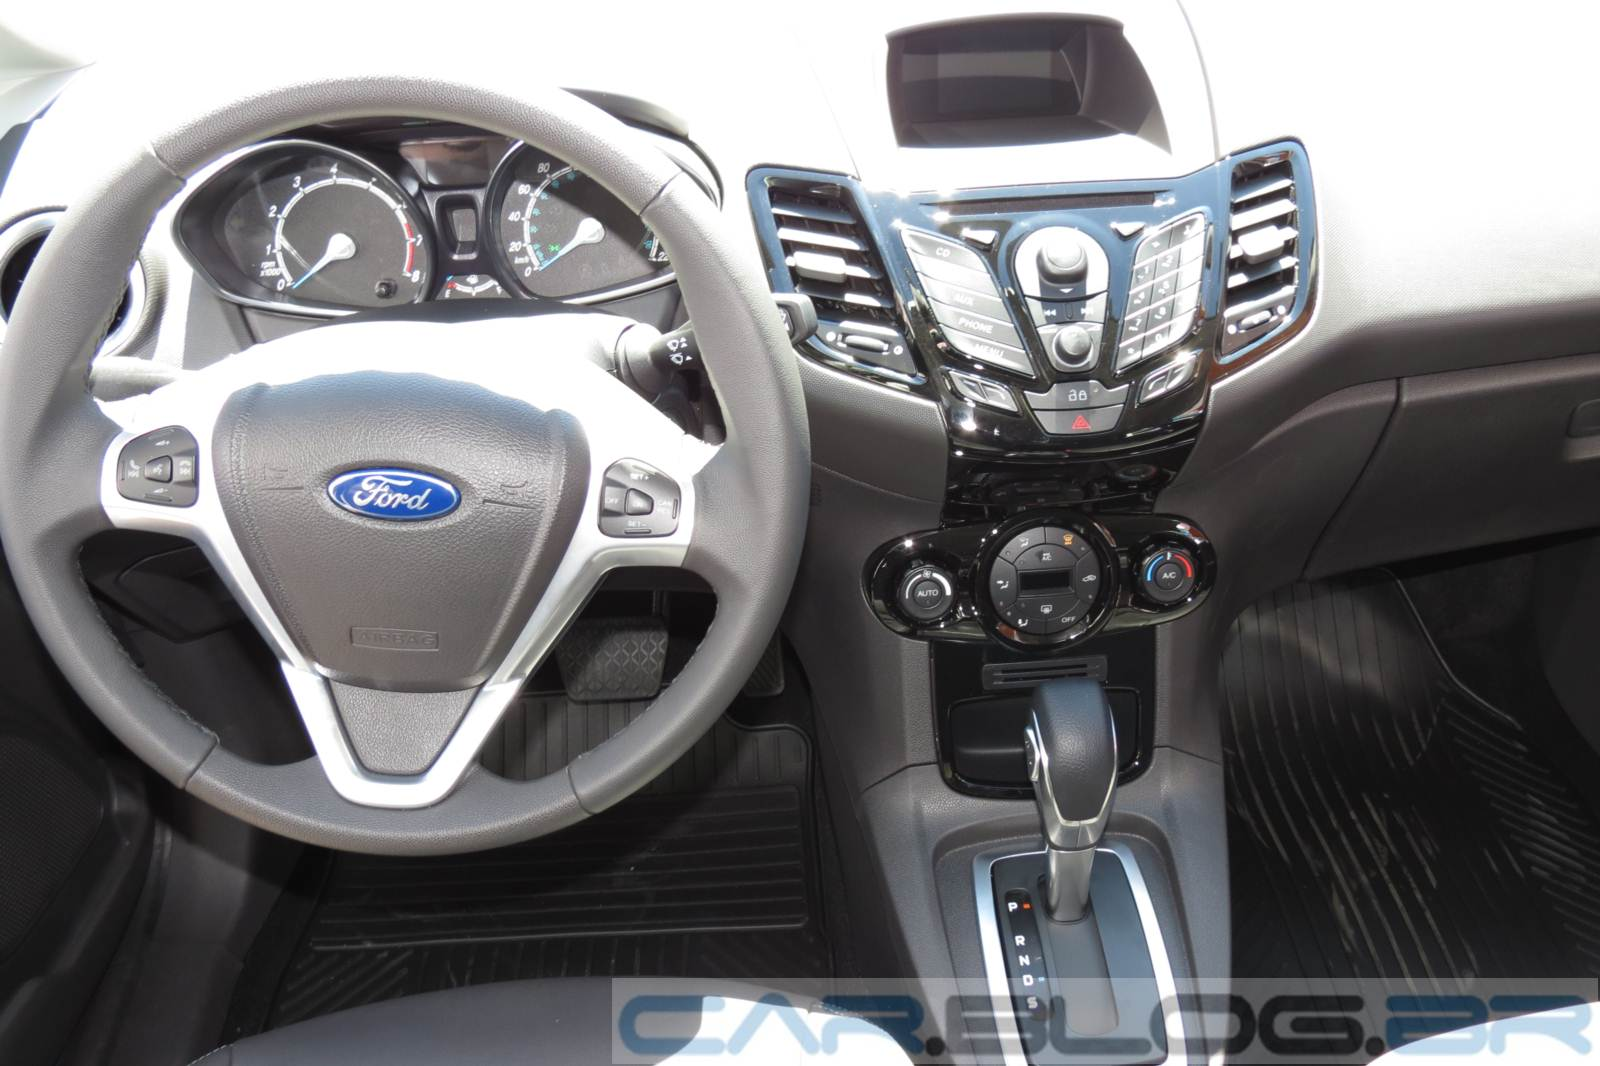 Ford Fiesta 2016 - tabela de preços